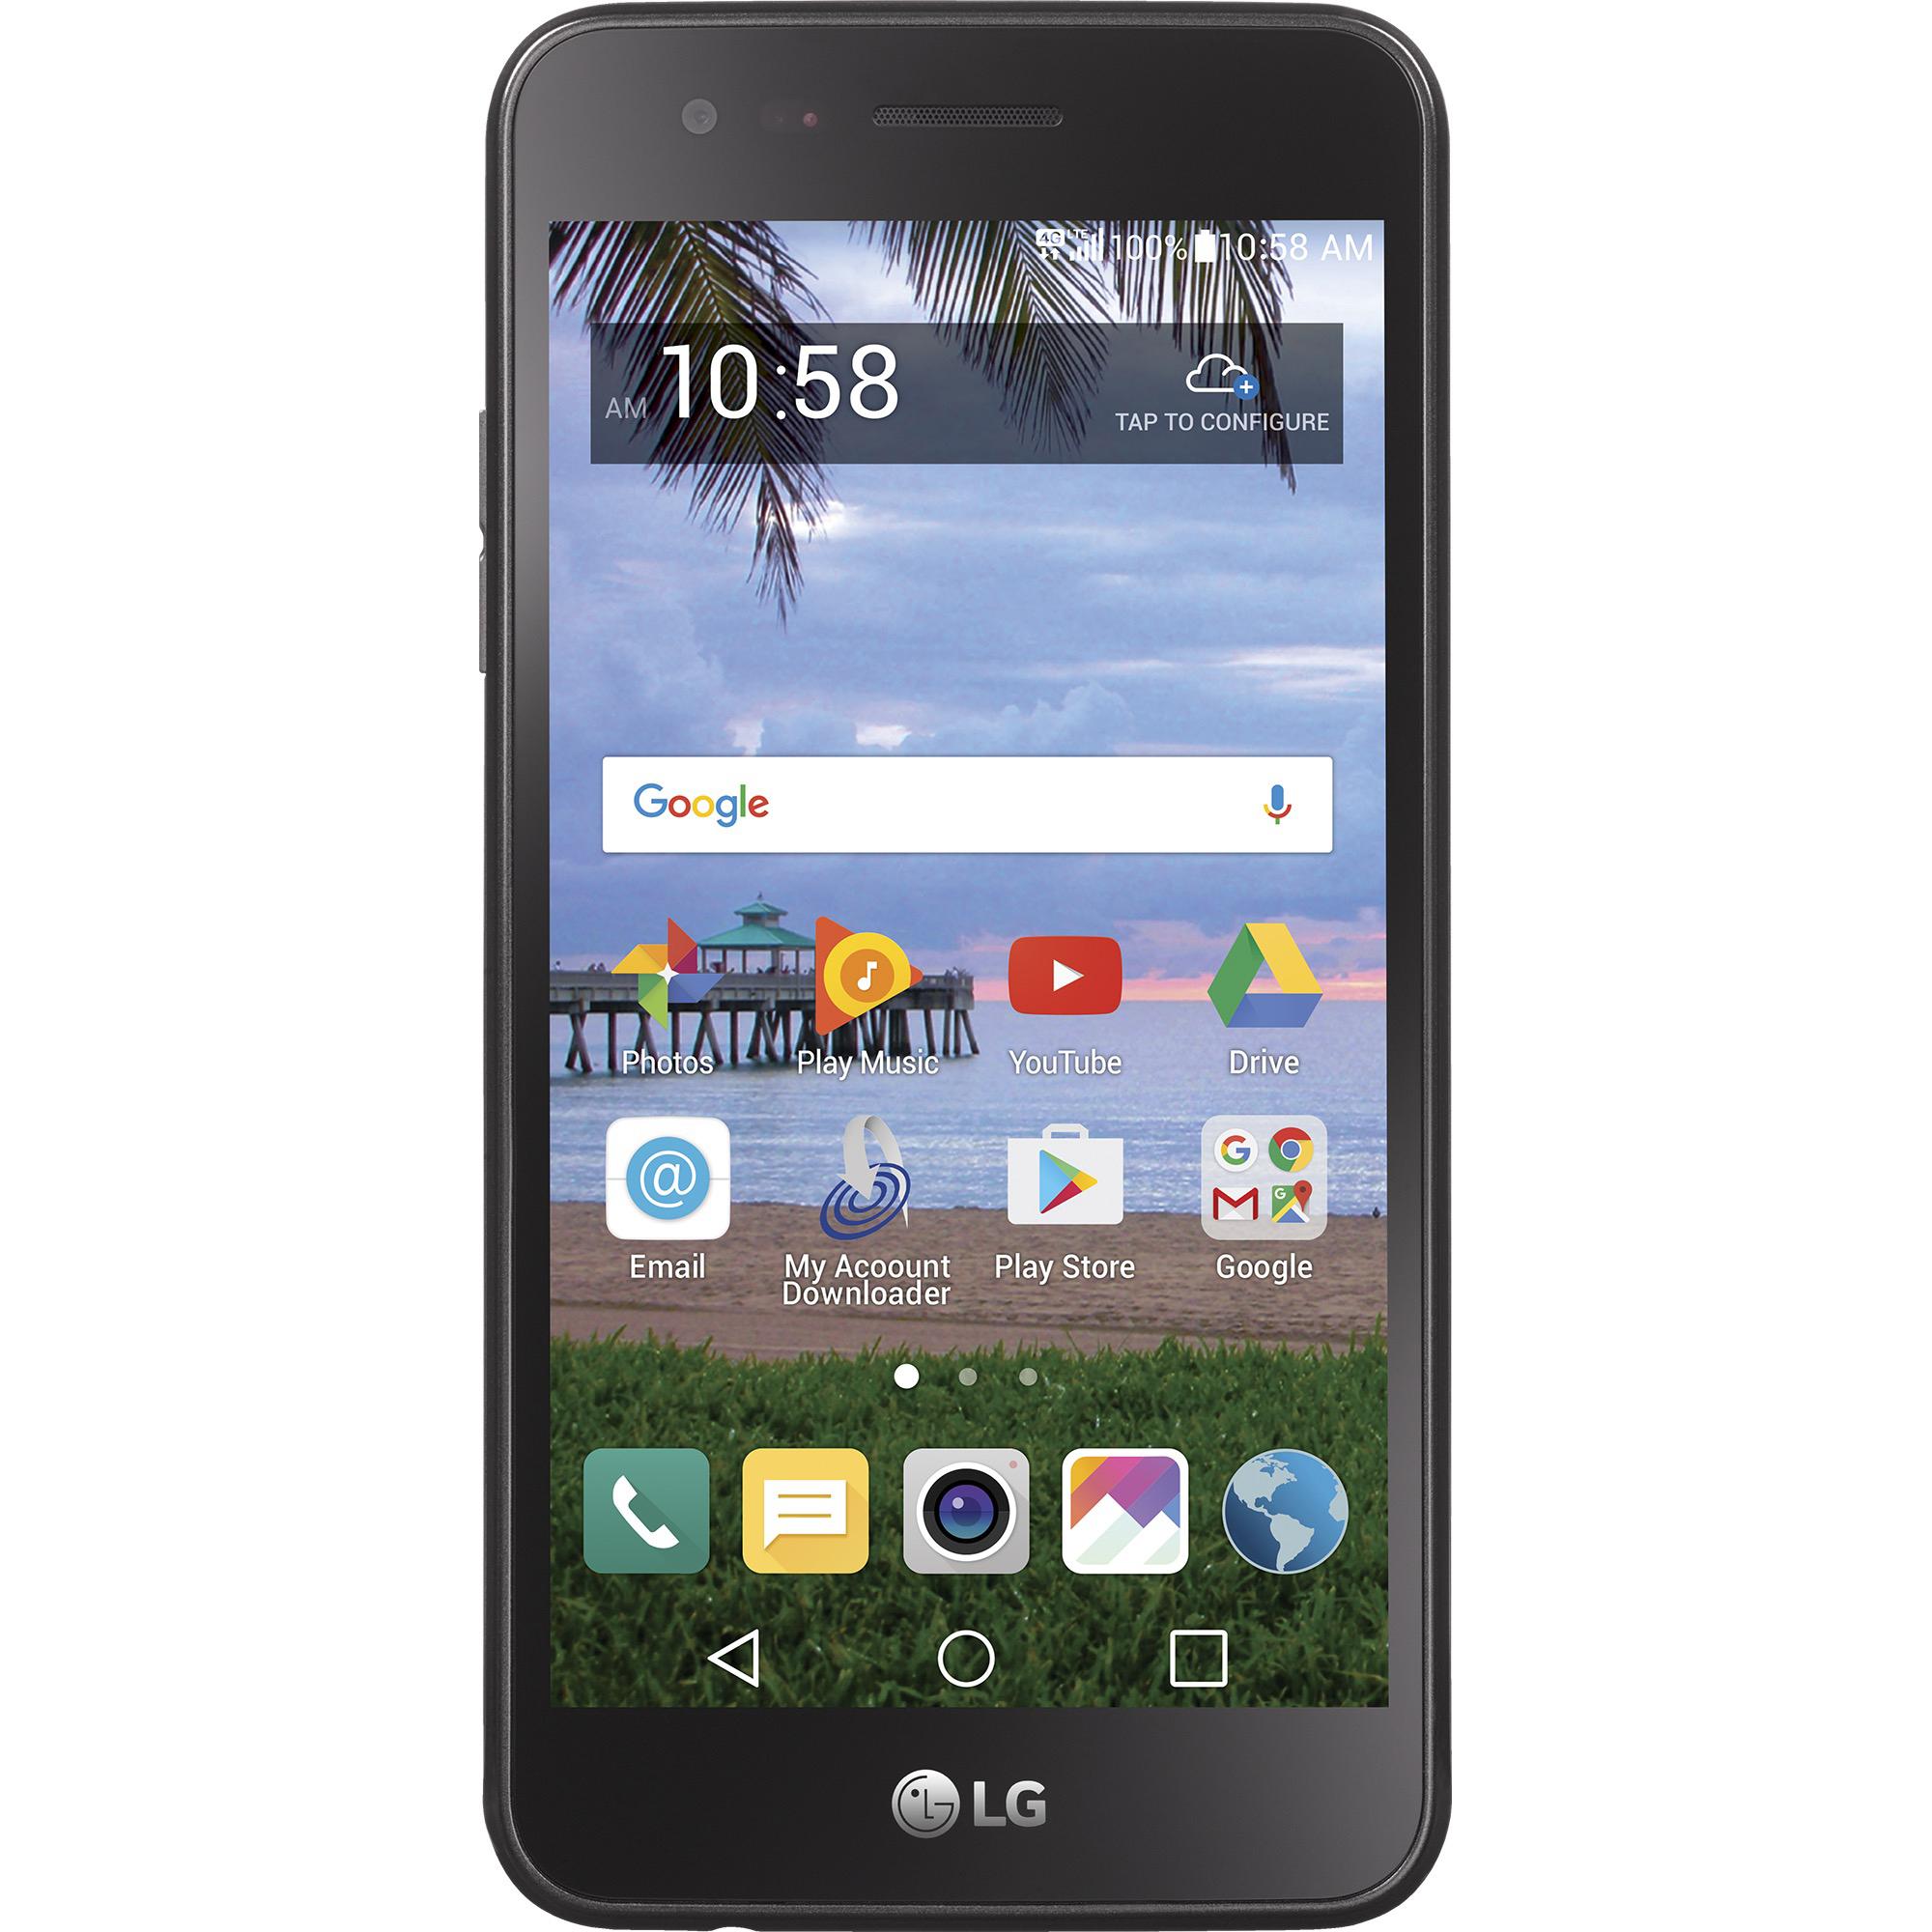 Refurbished LG STLGL58VCP Rebel 2 4G LTE Straight Talk Prepaid Smartphone - Black